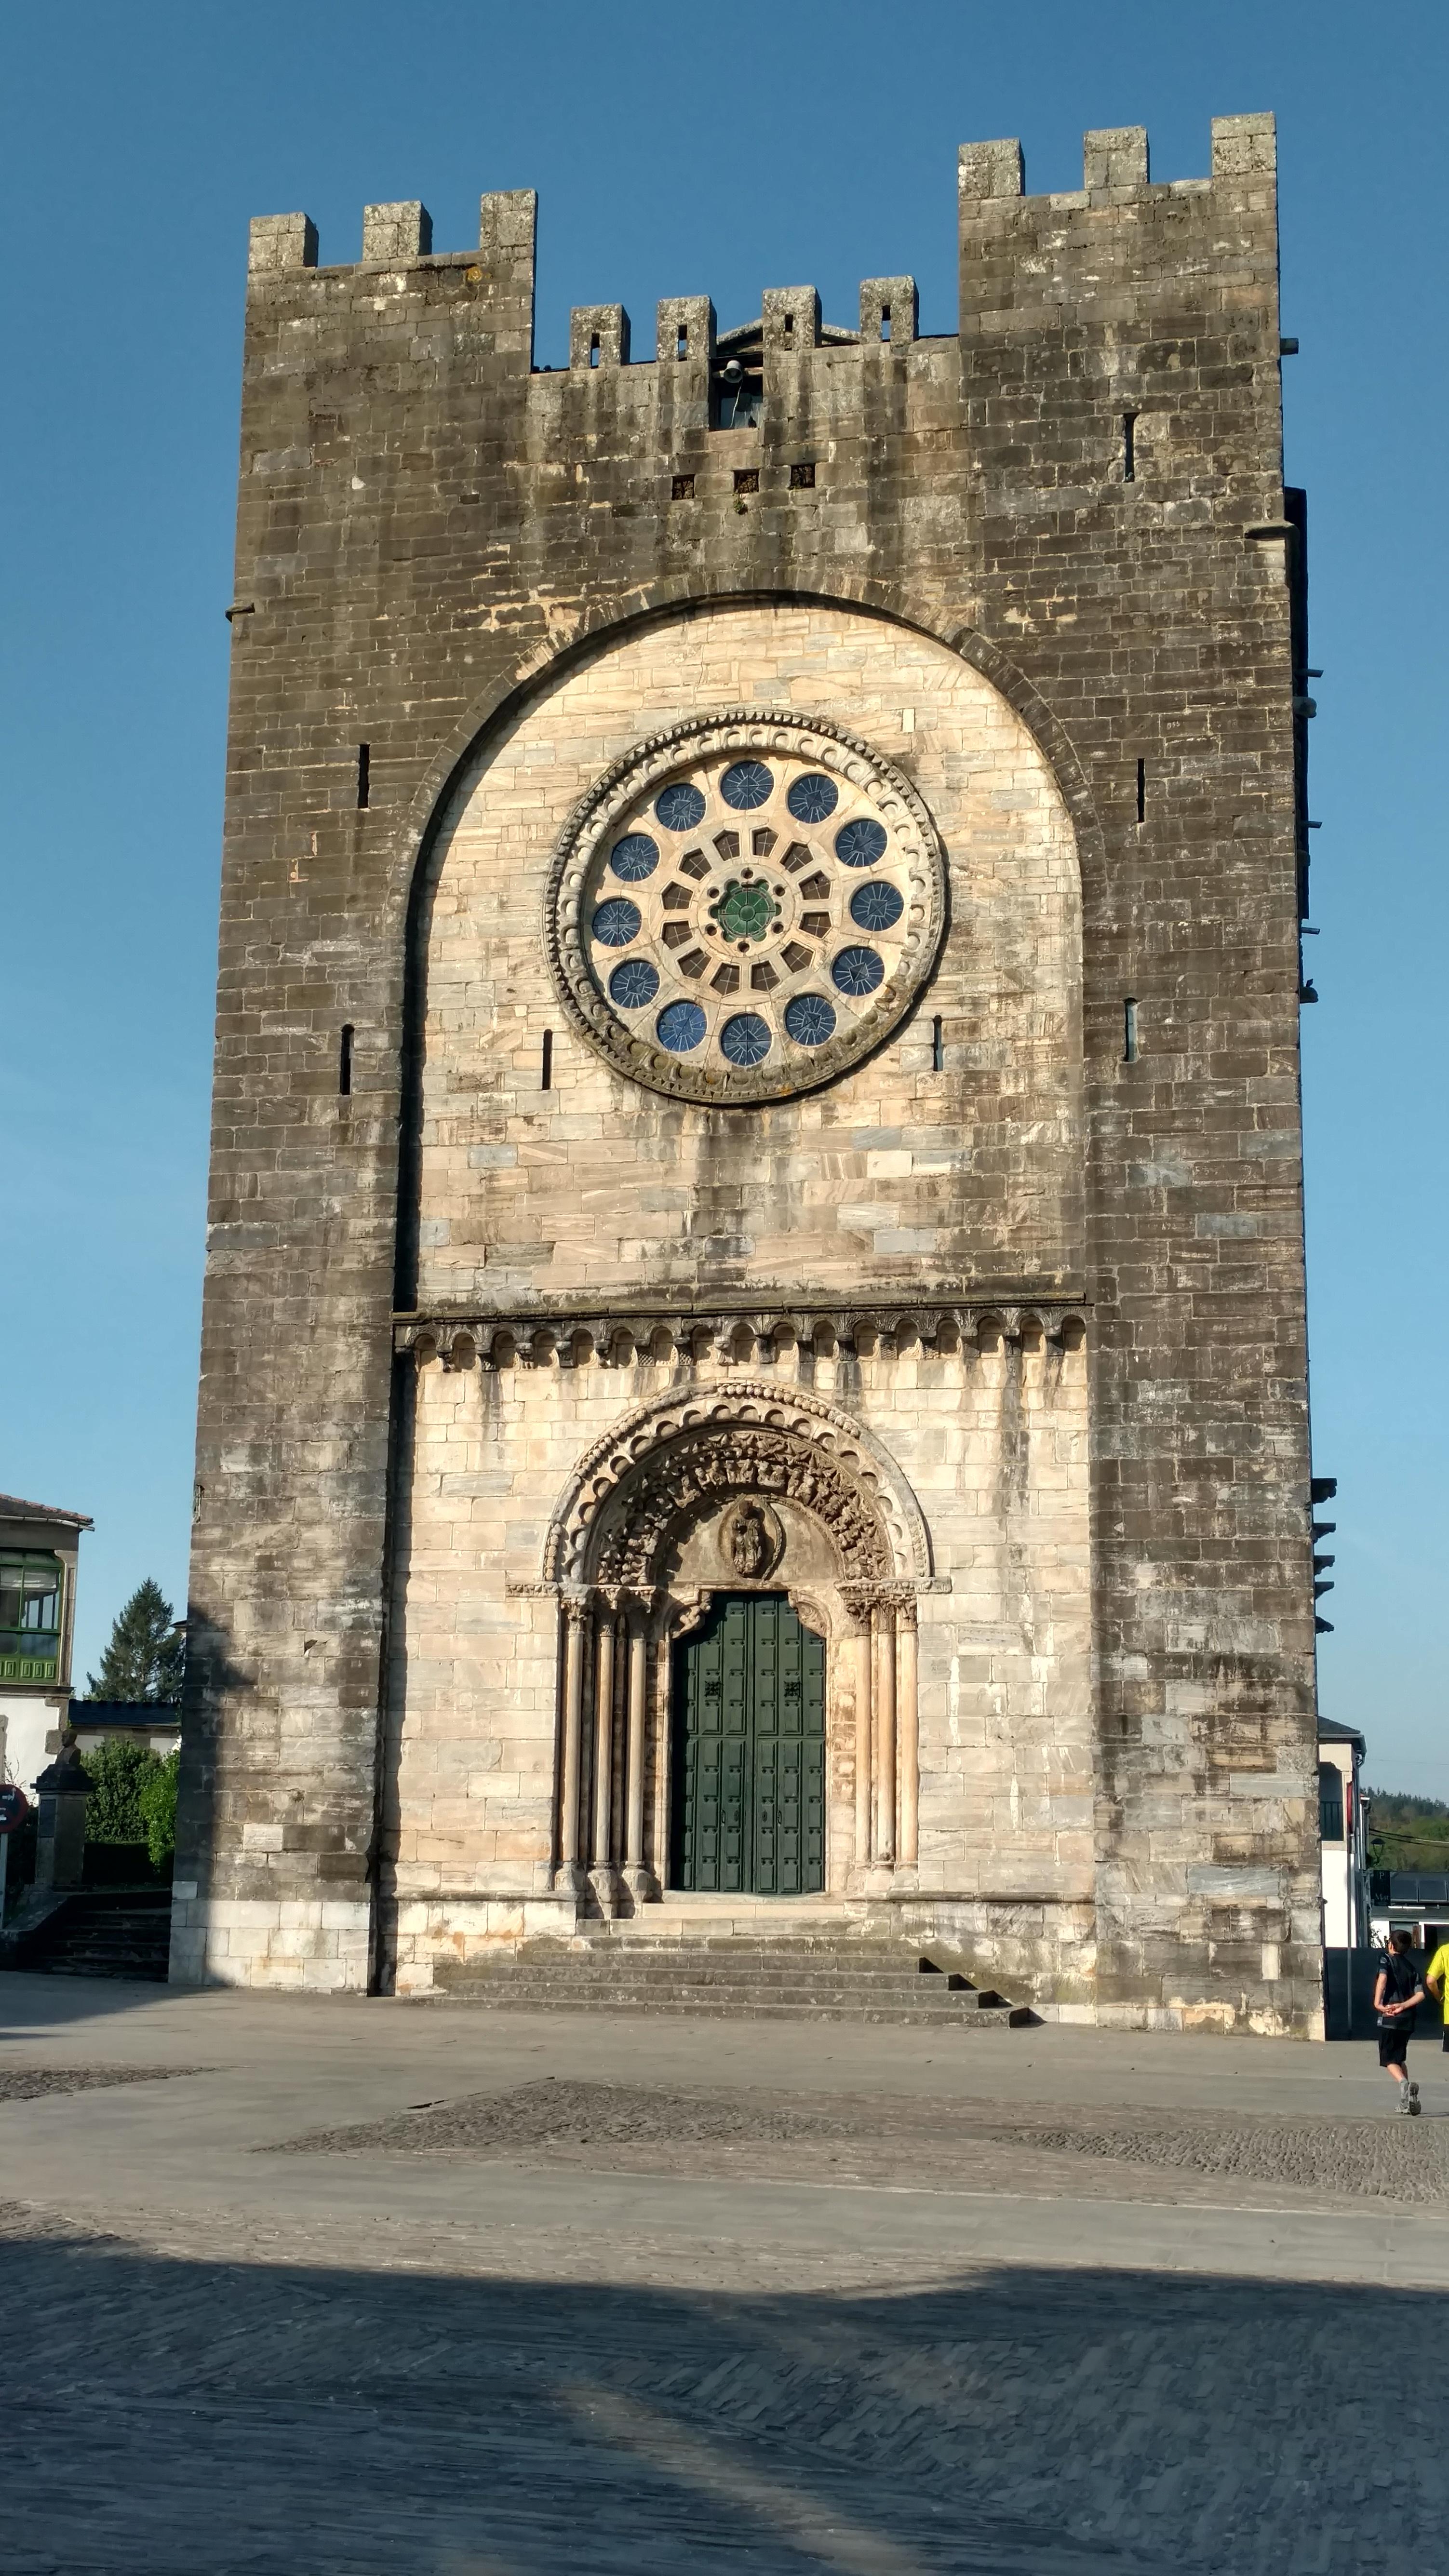 Iglesia de Portomarín donde puedes sellar tu pasaporte al llegar